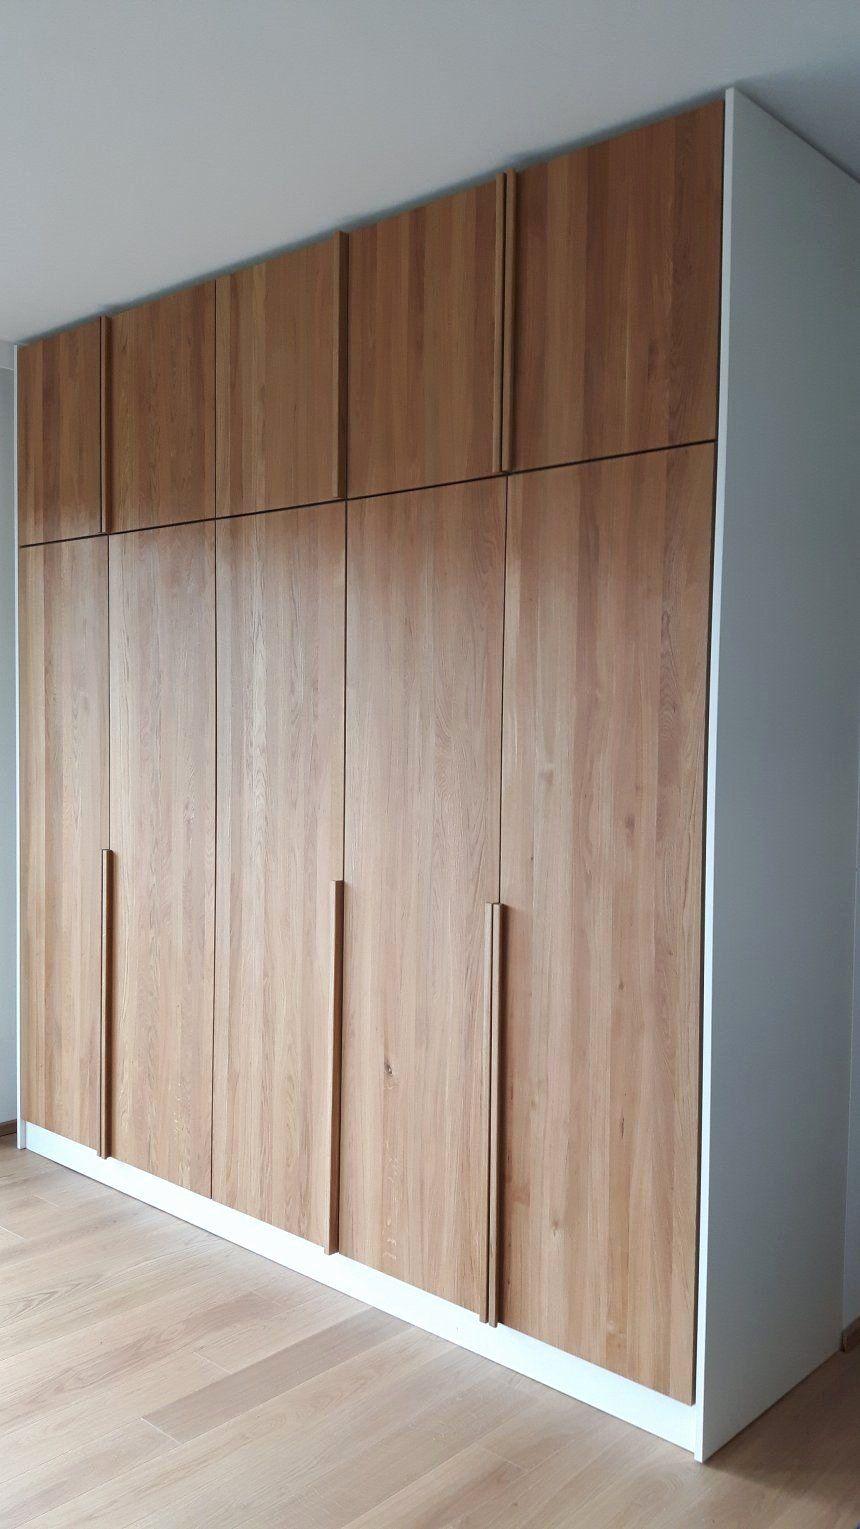 Bedroom Cabinet Design Ideas New Bedroom Cupboard Designs Photos